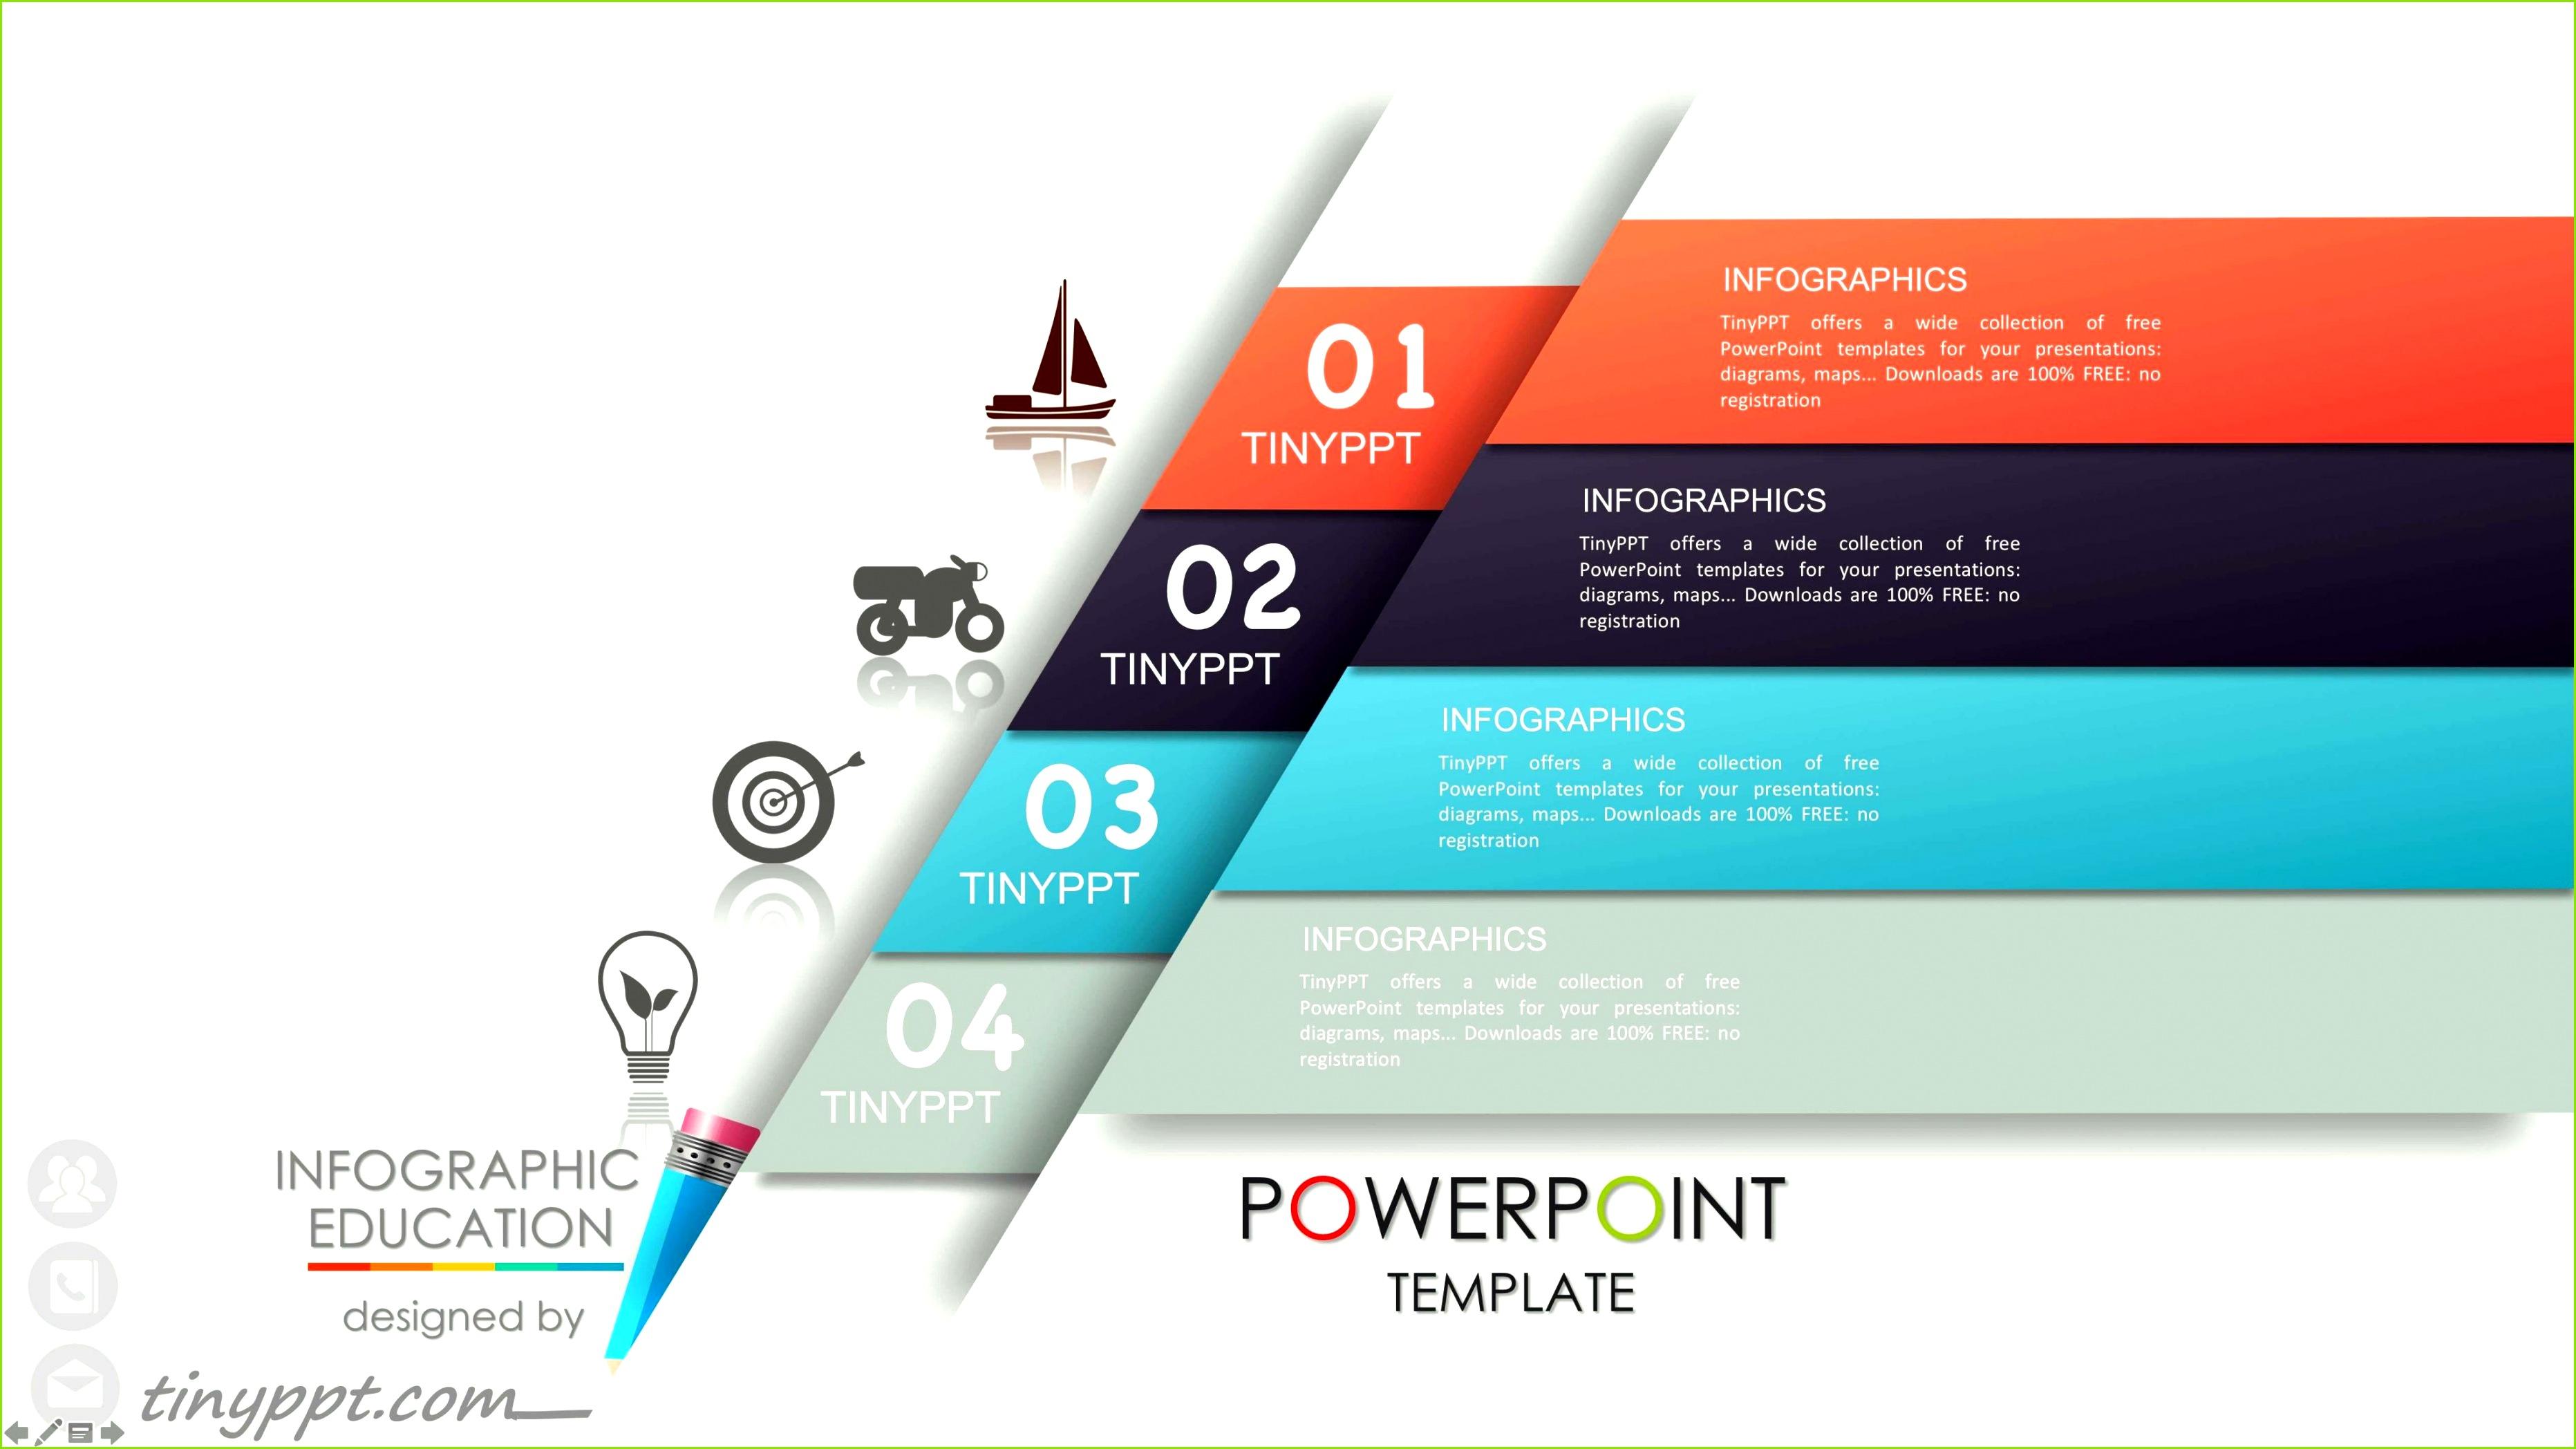 Top Web Design Presentation et74